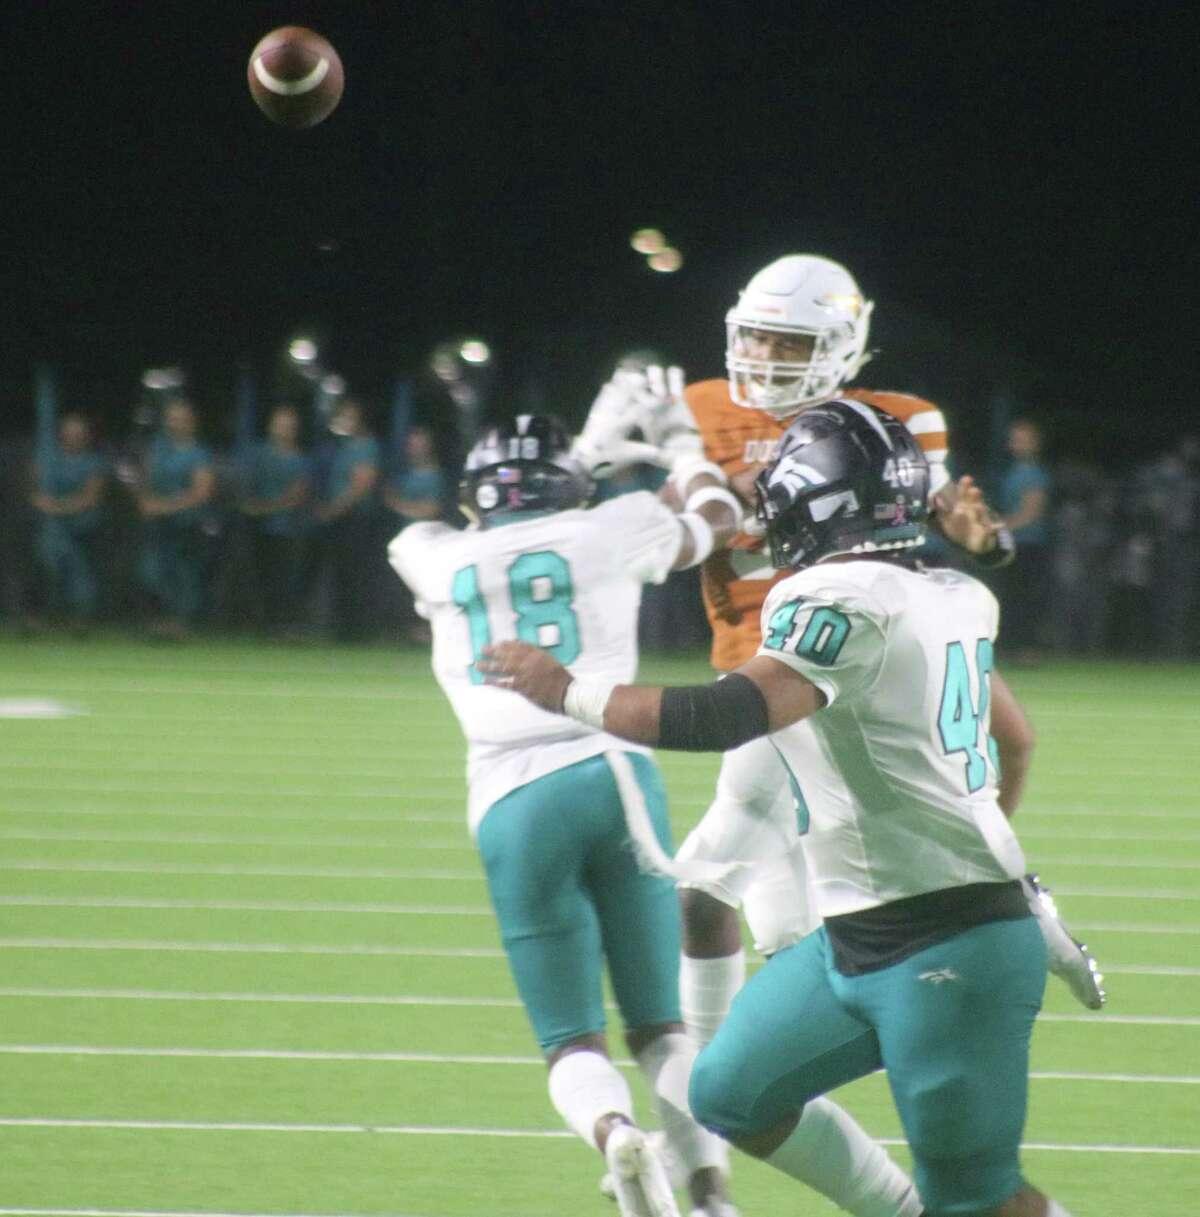 Dobie quarterback Cameron Gray throws a pass against the Memorial rush in second-quarter action Friday night.